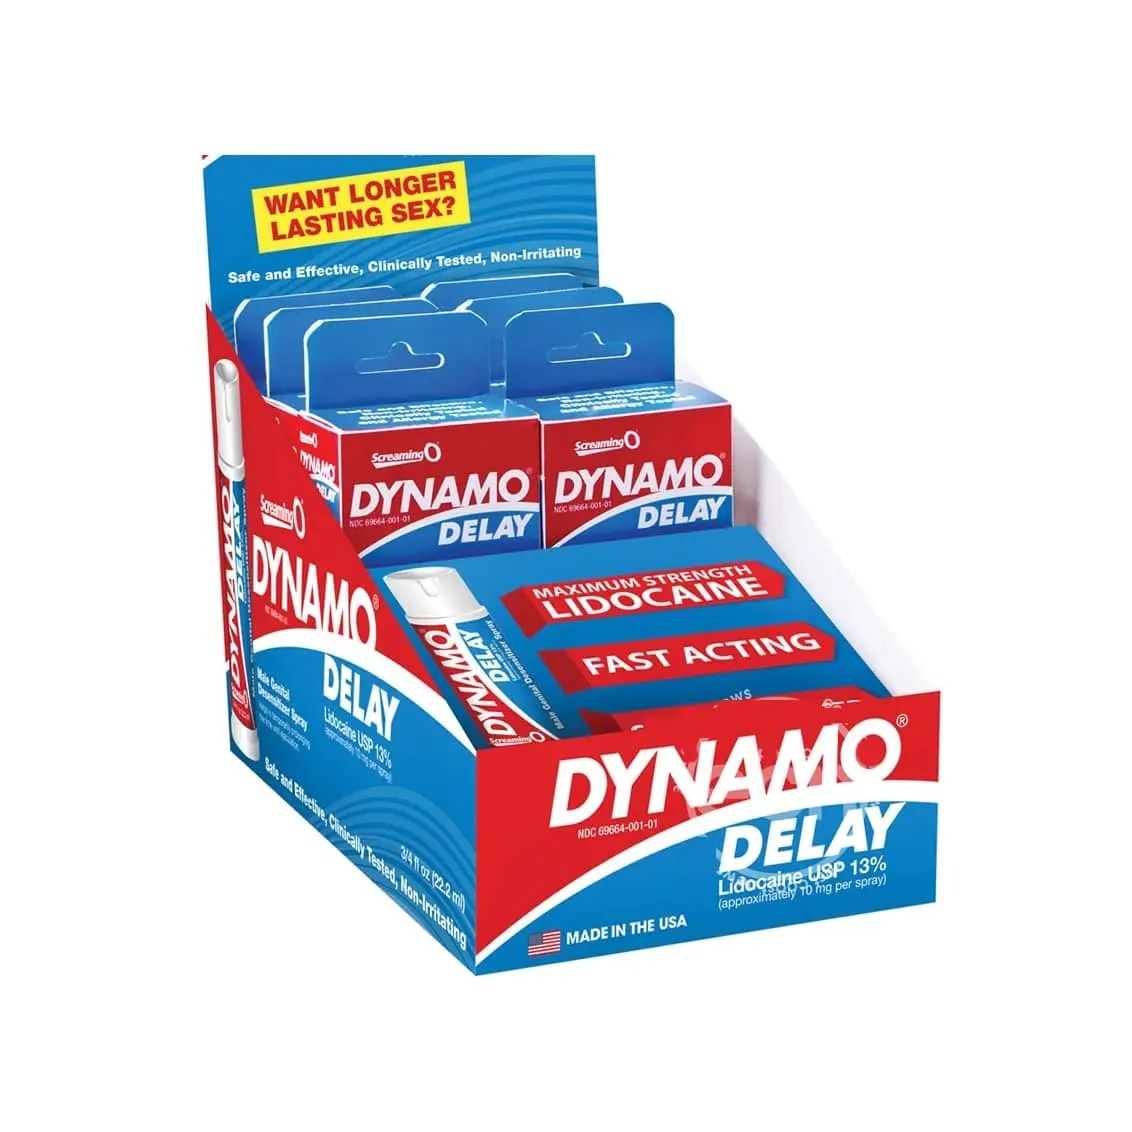 Dynamo Male Desensitizing Delay Spray – 6 pack